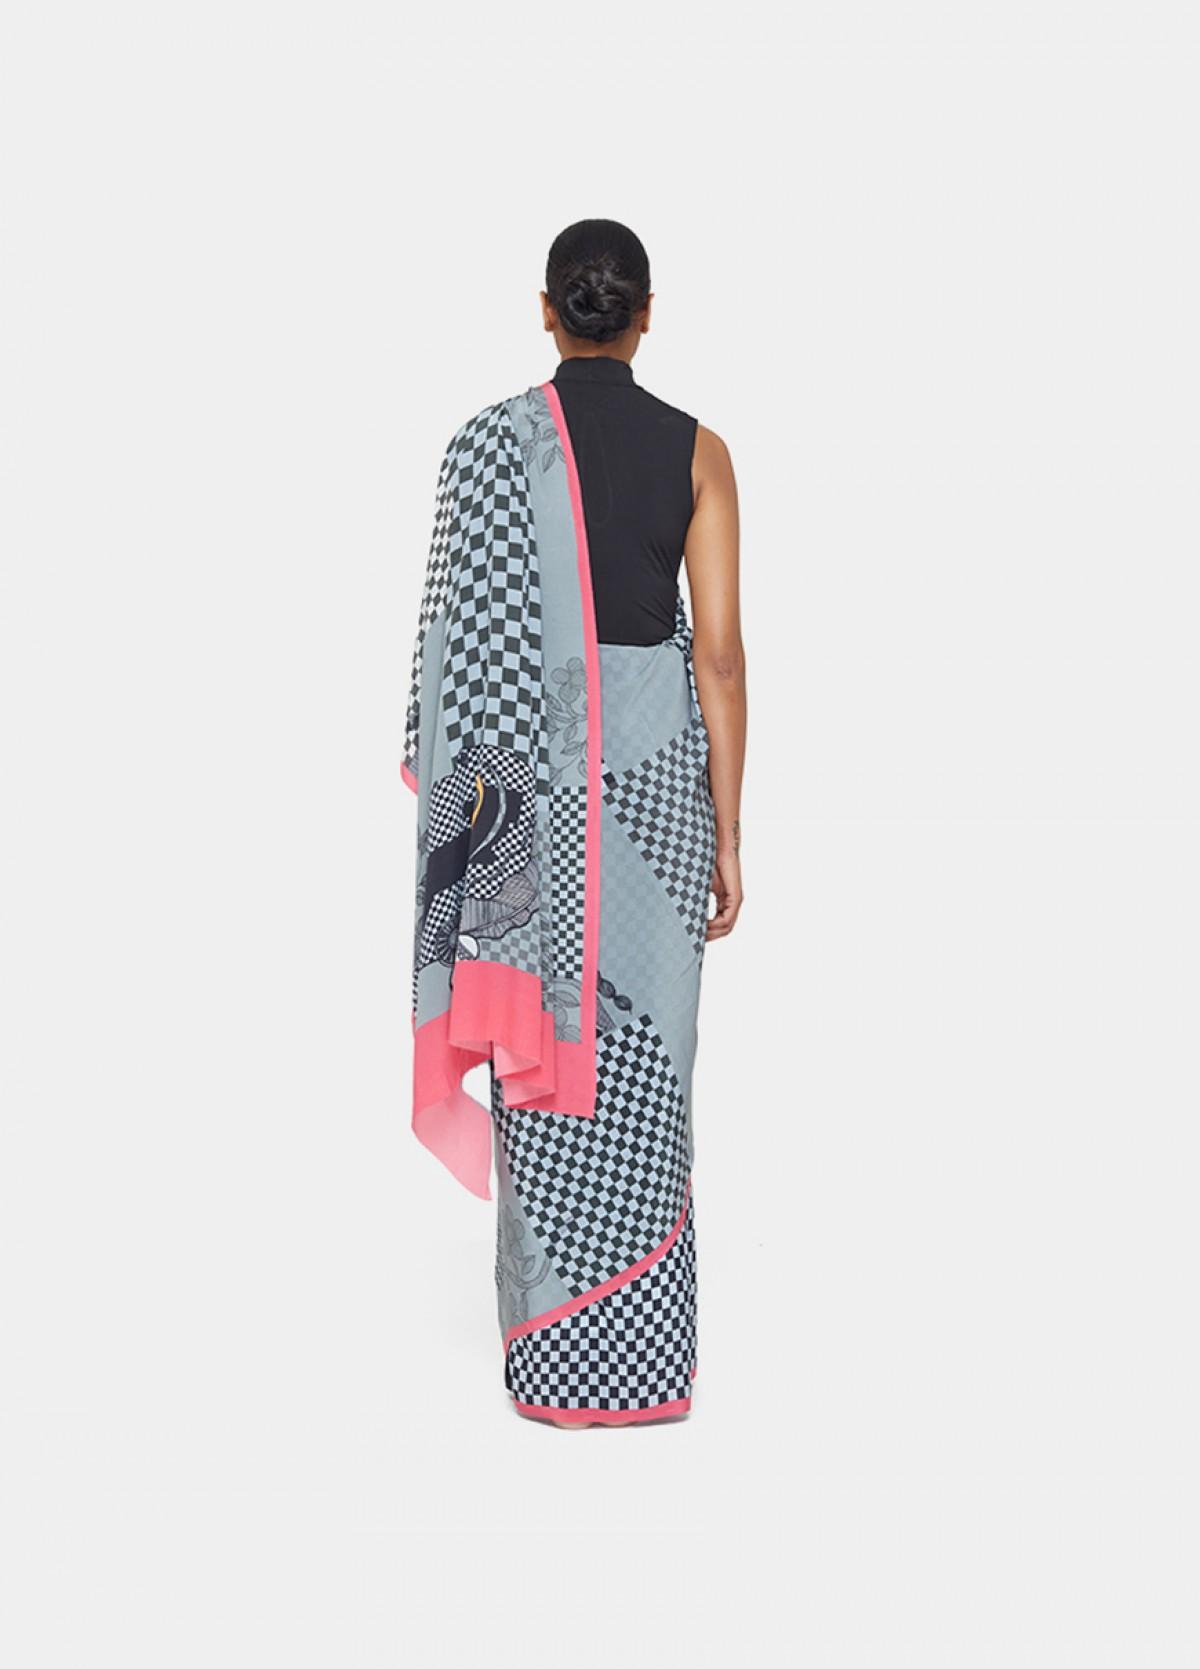 The Womaniya Sari